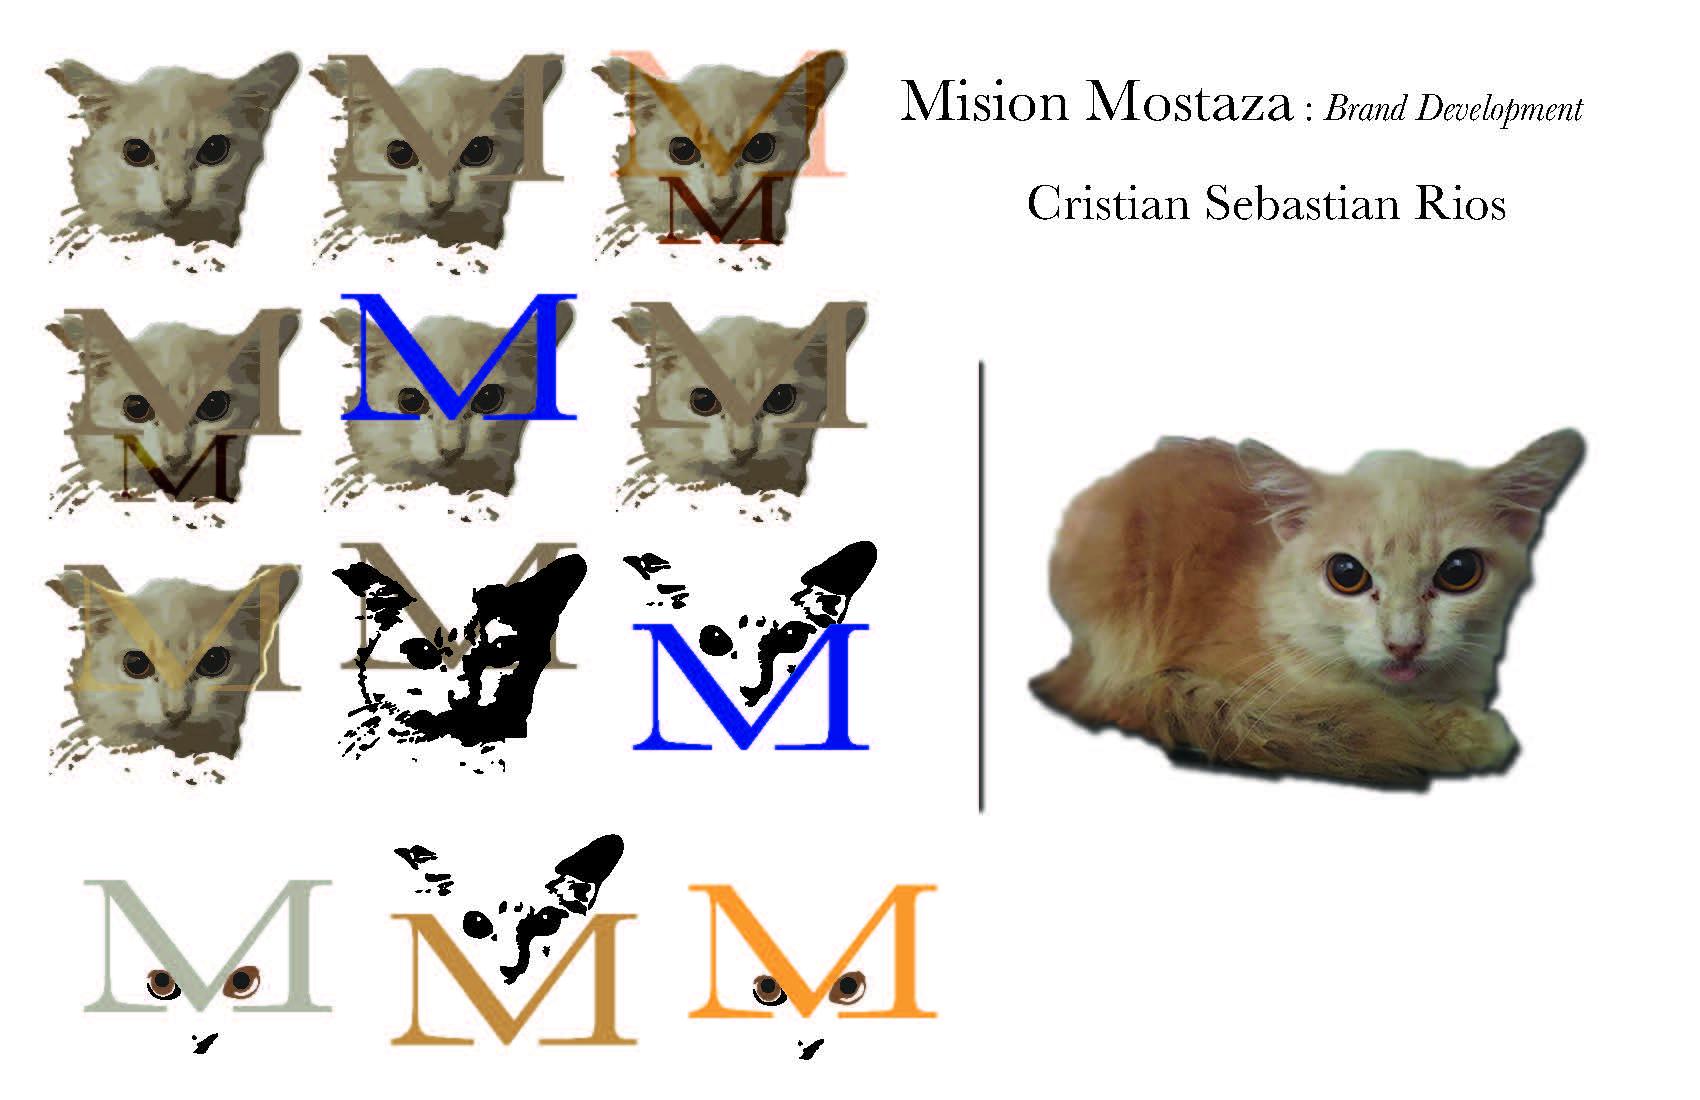 Mision Mostaza Logos.jpg